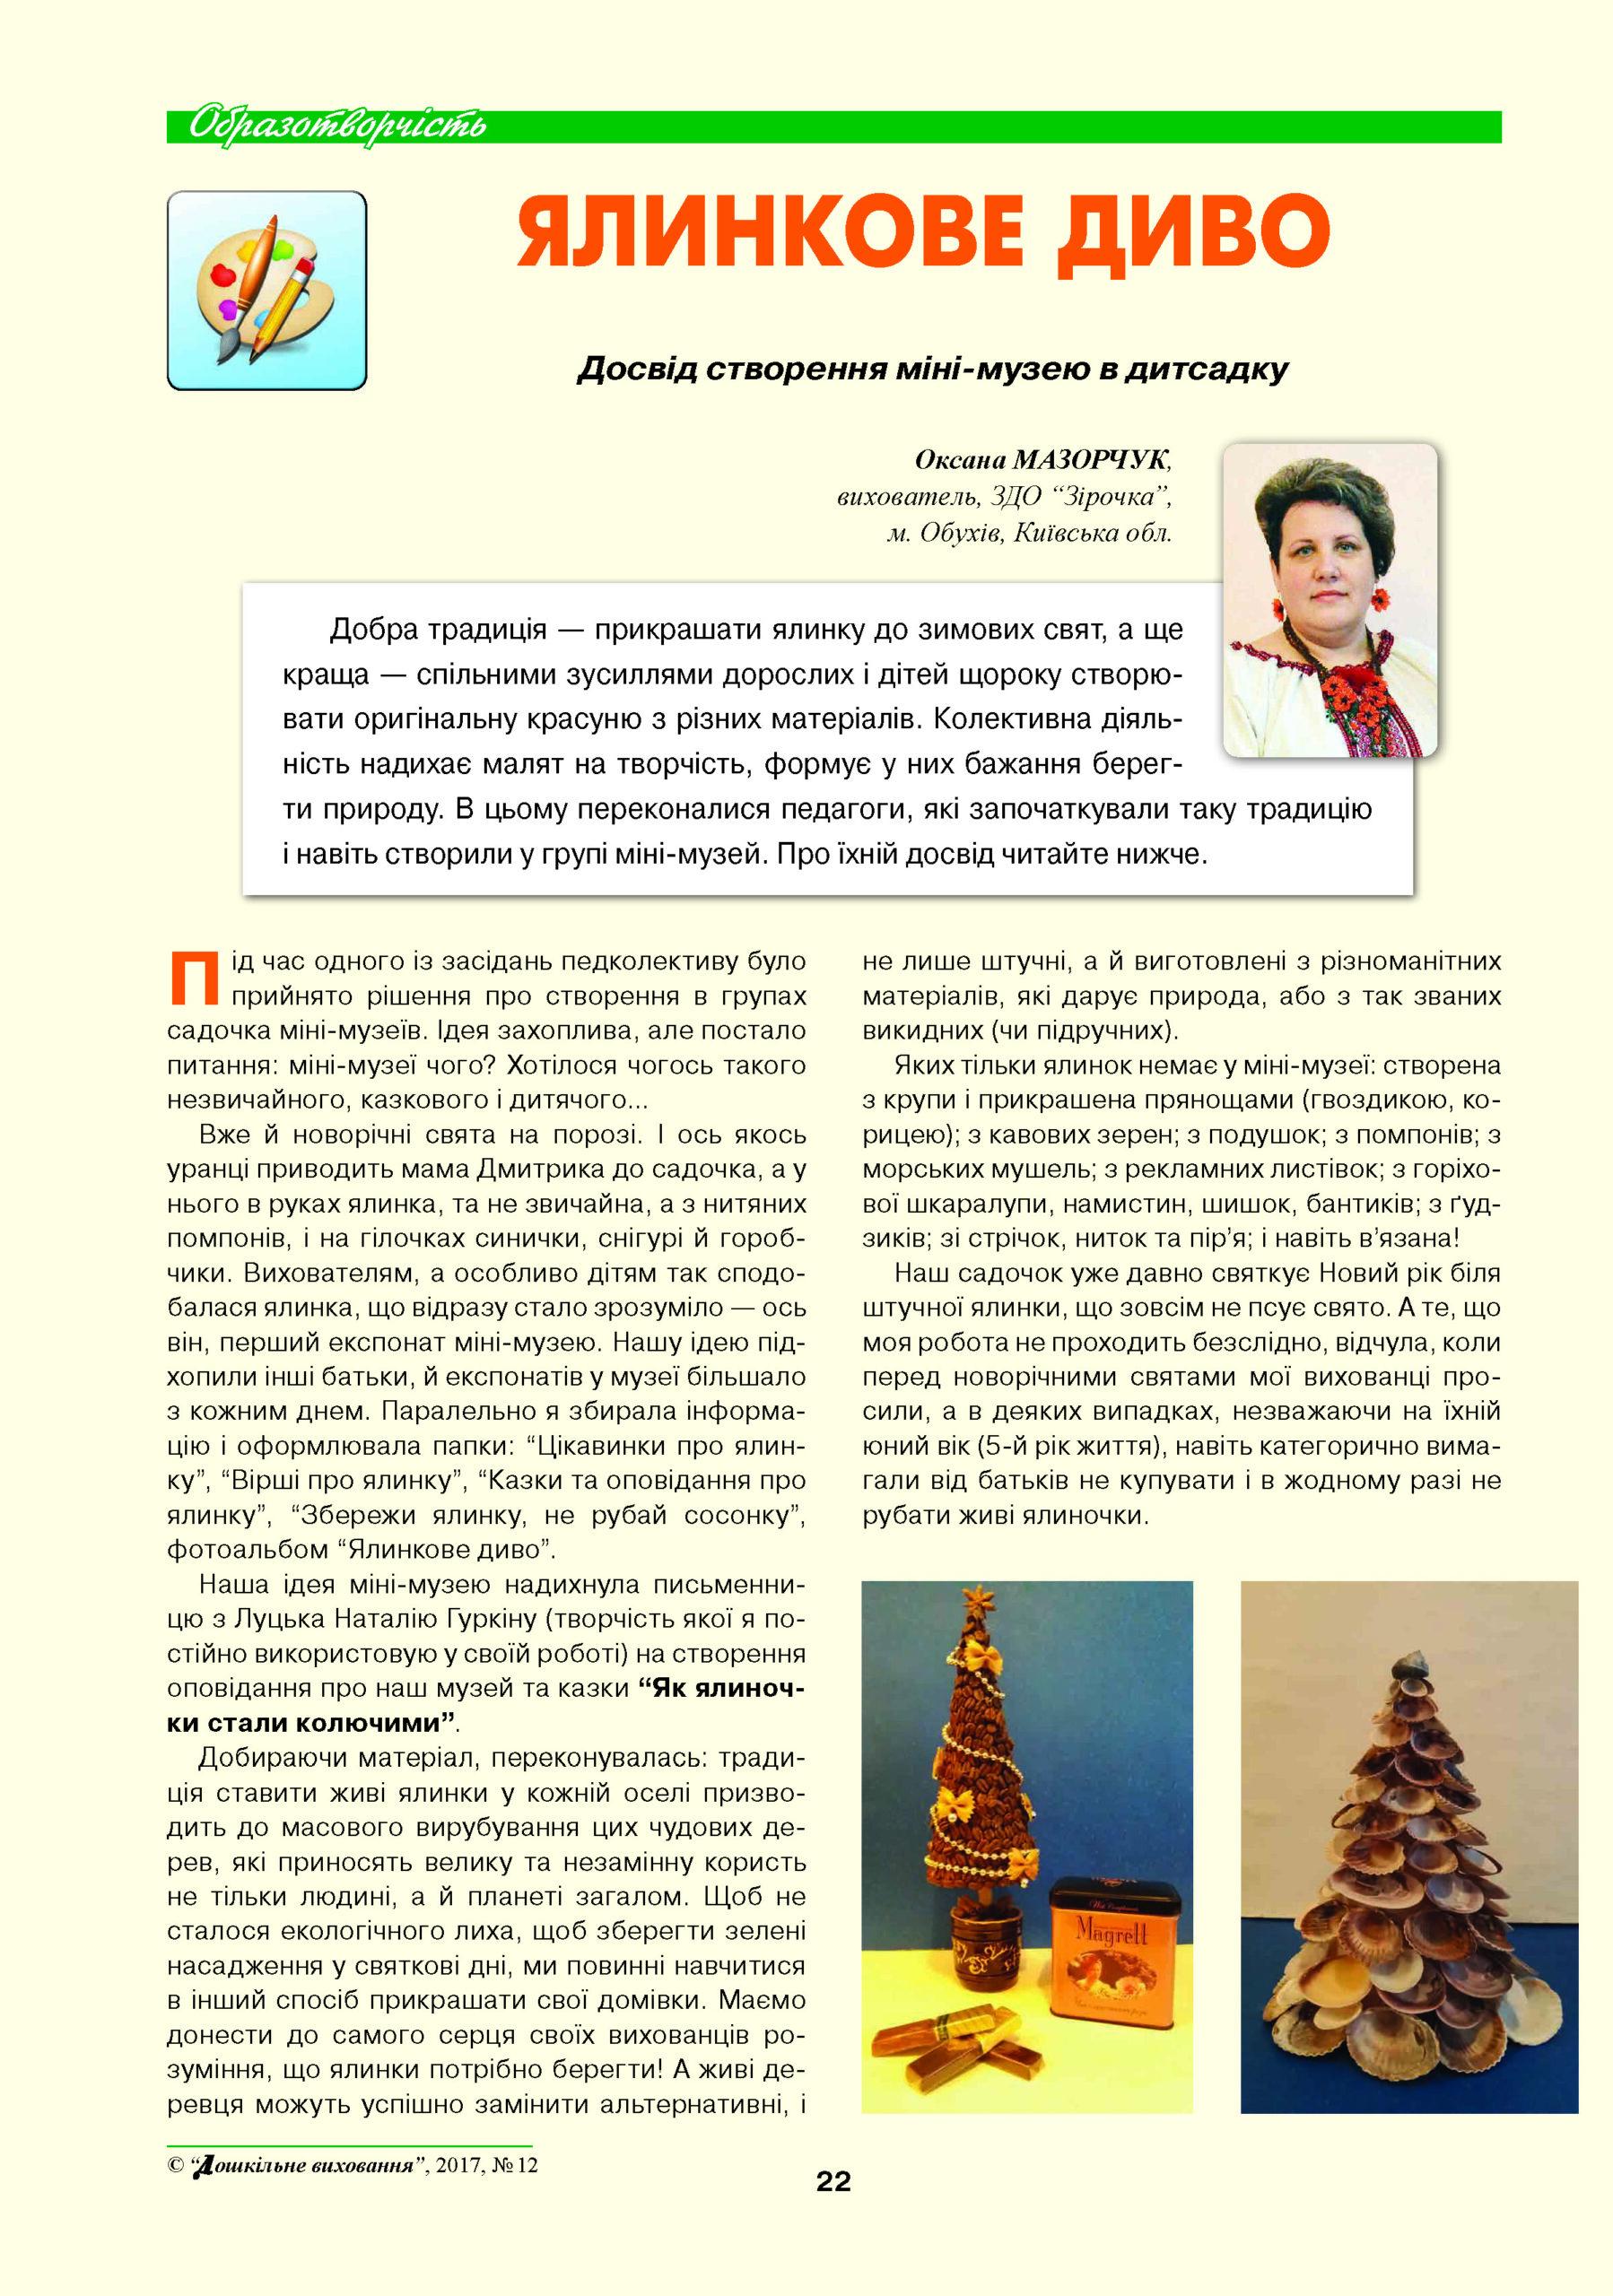 Dv_2017-12_Страница_22.jpg